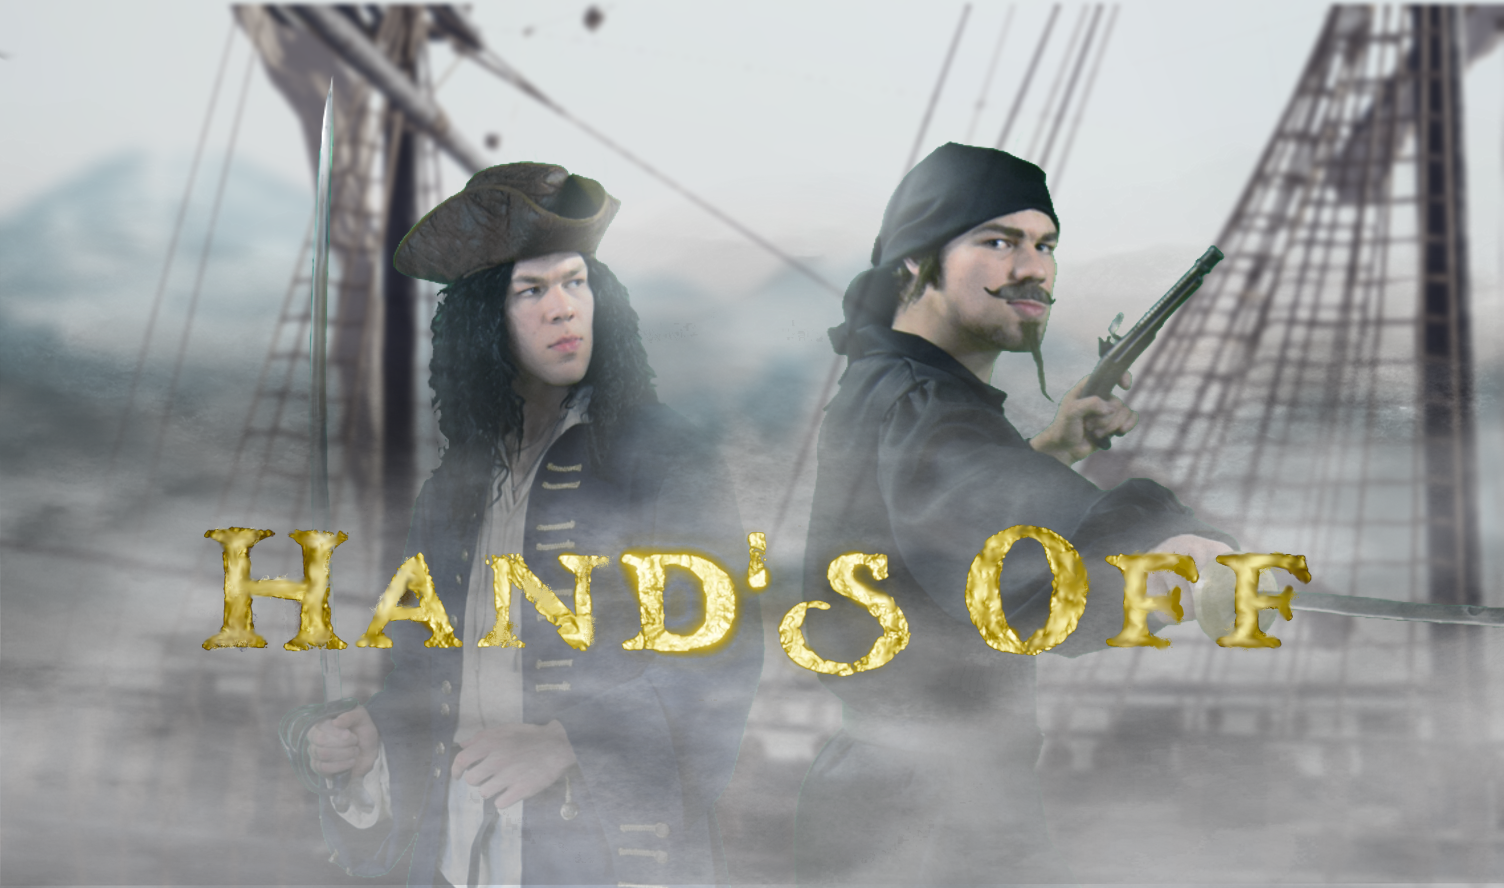 Hand's Off